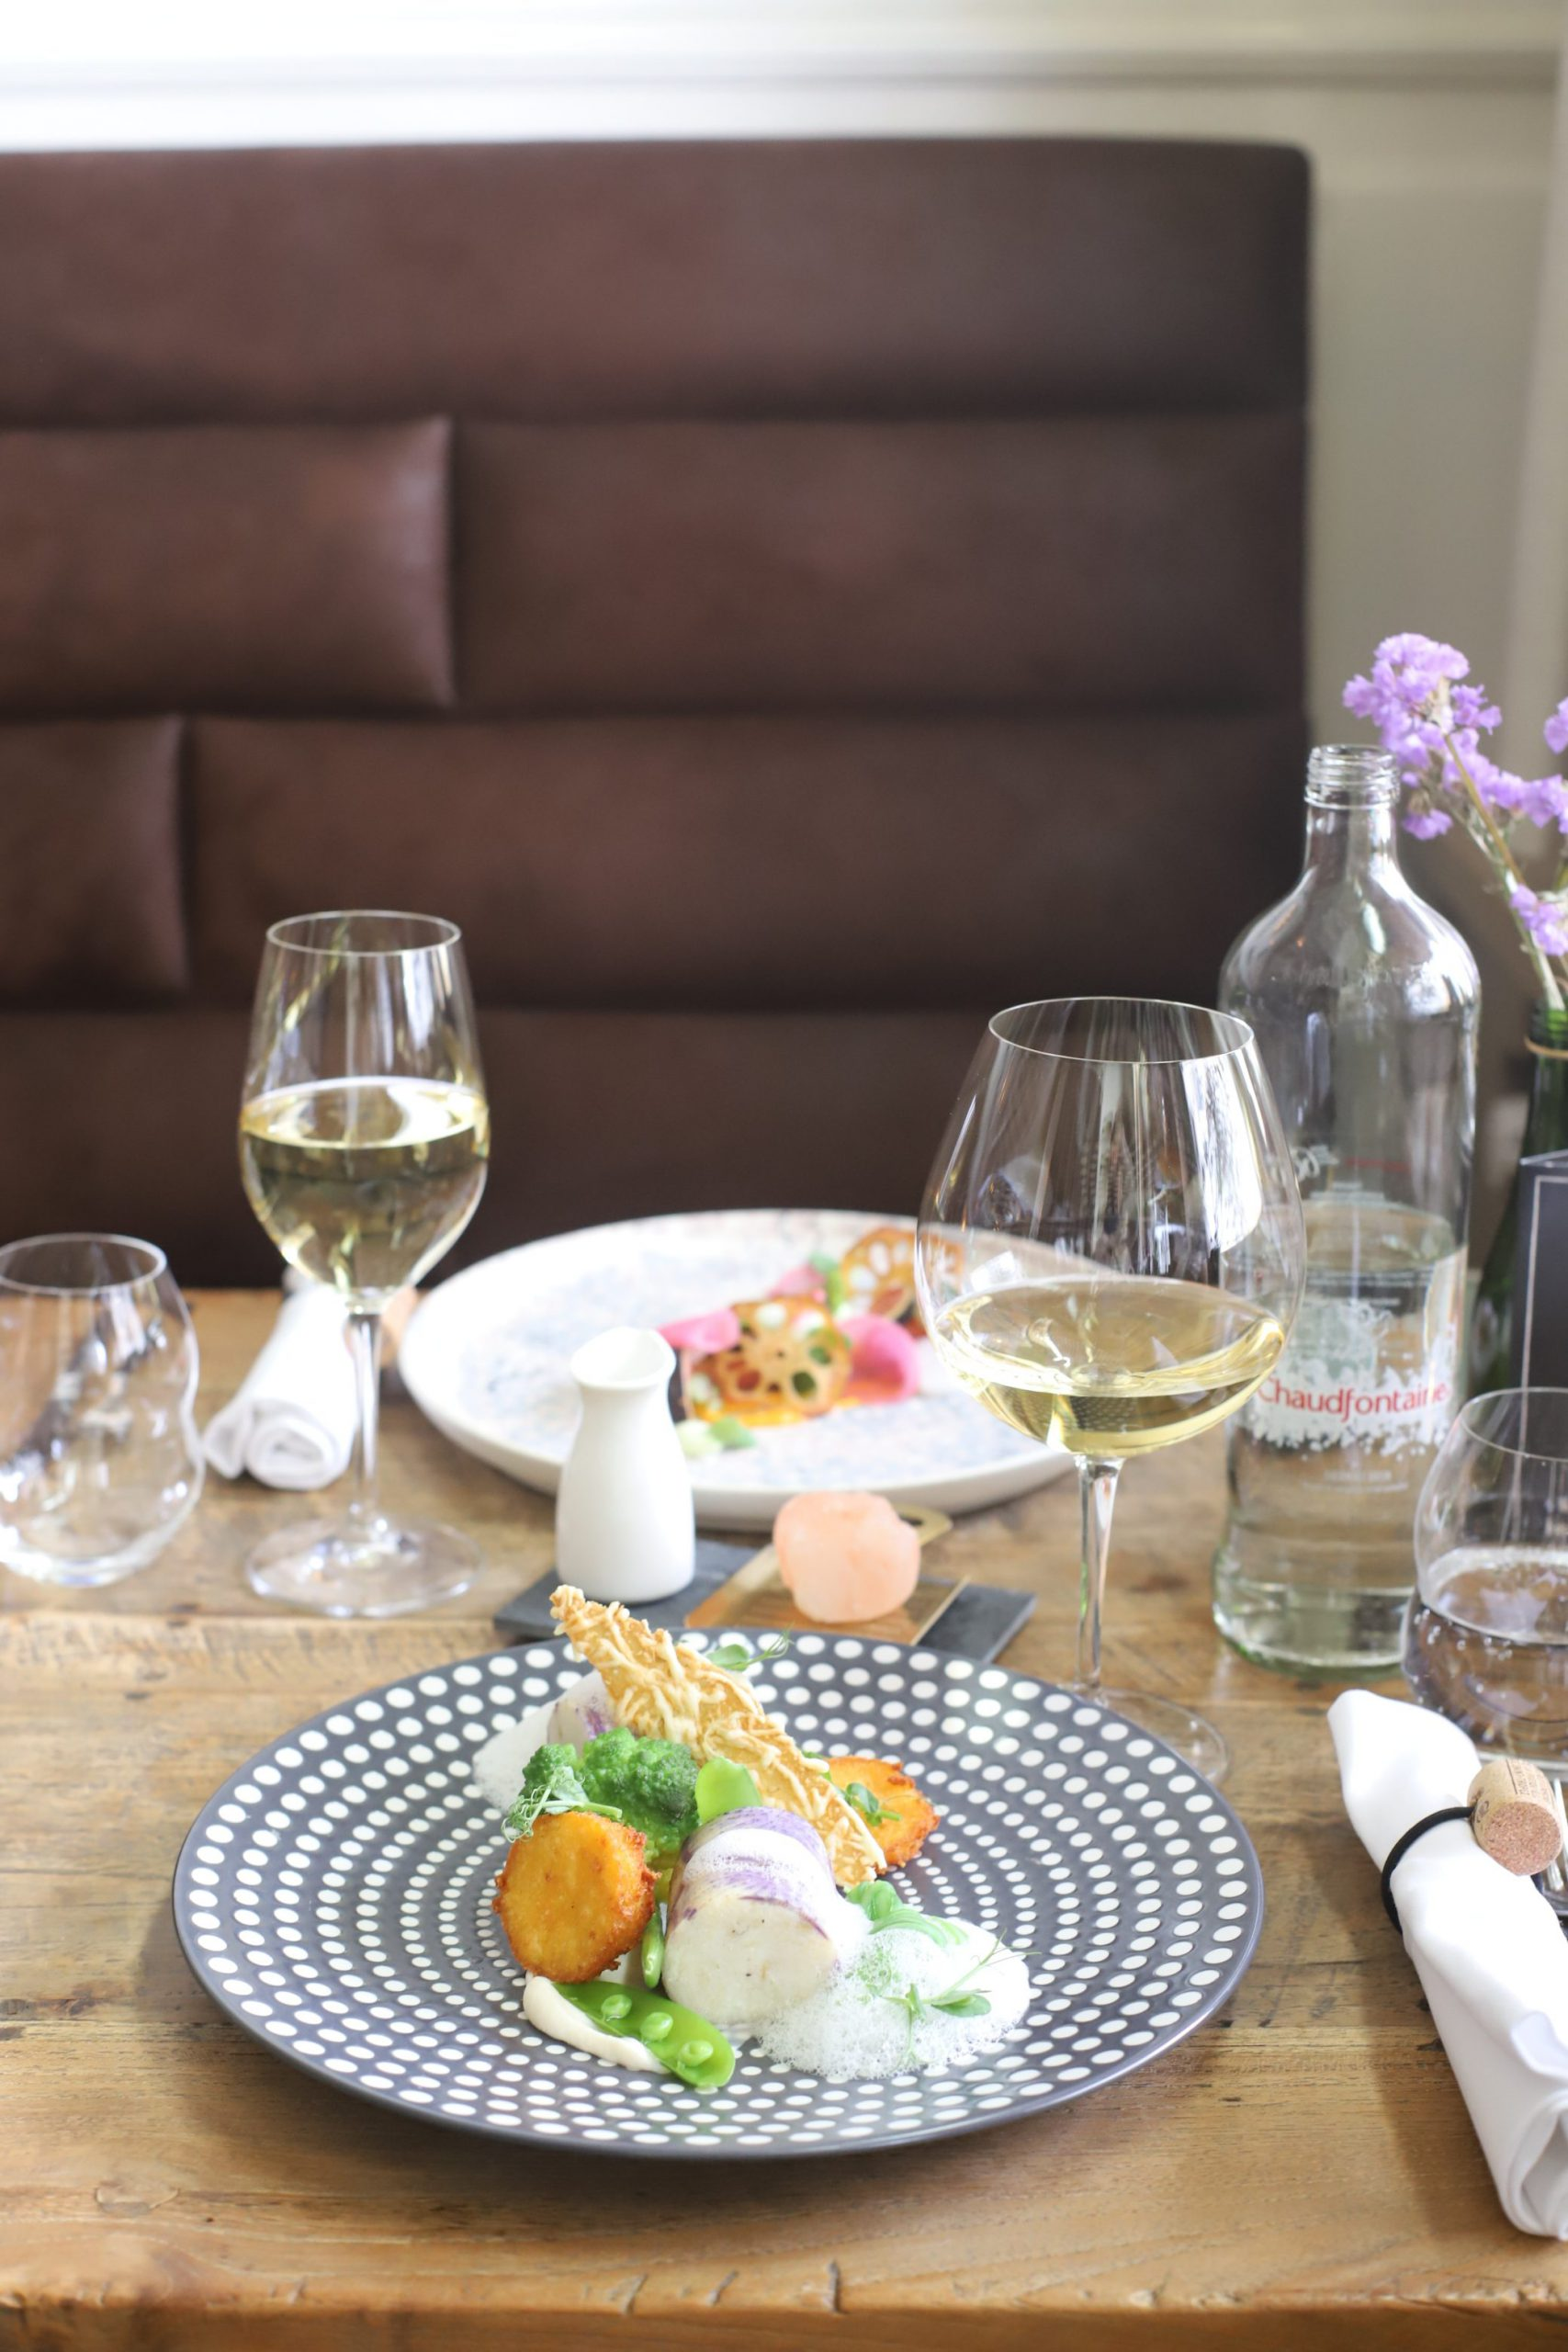 Plat of bruisend water 'The Lemon Kitchen